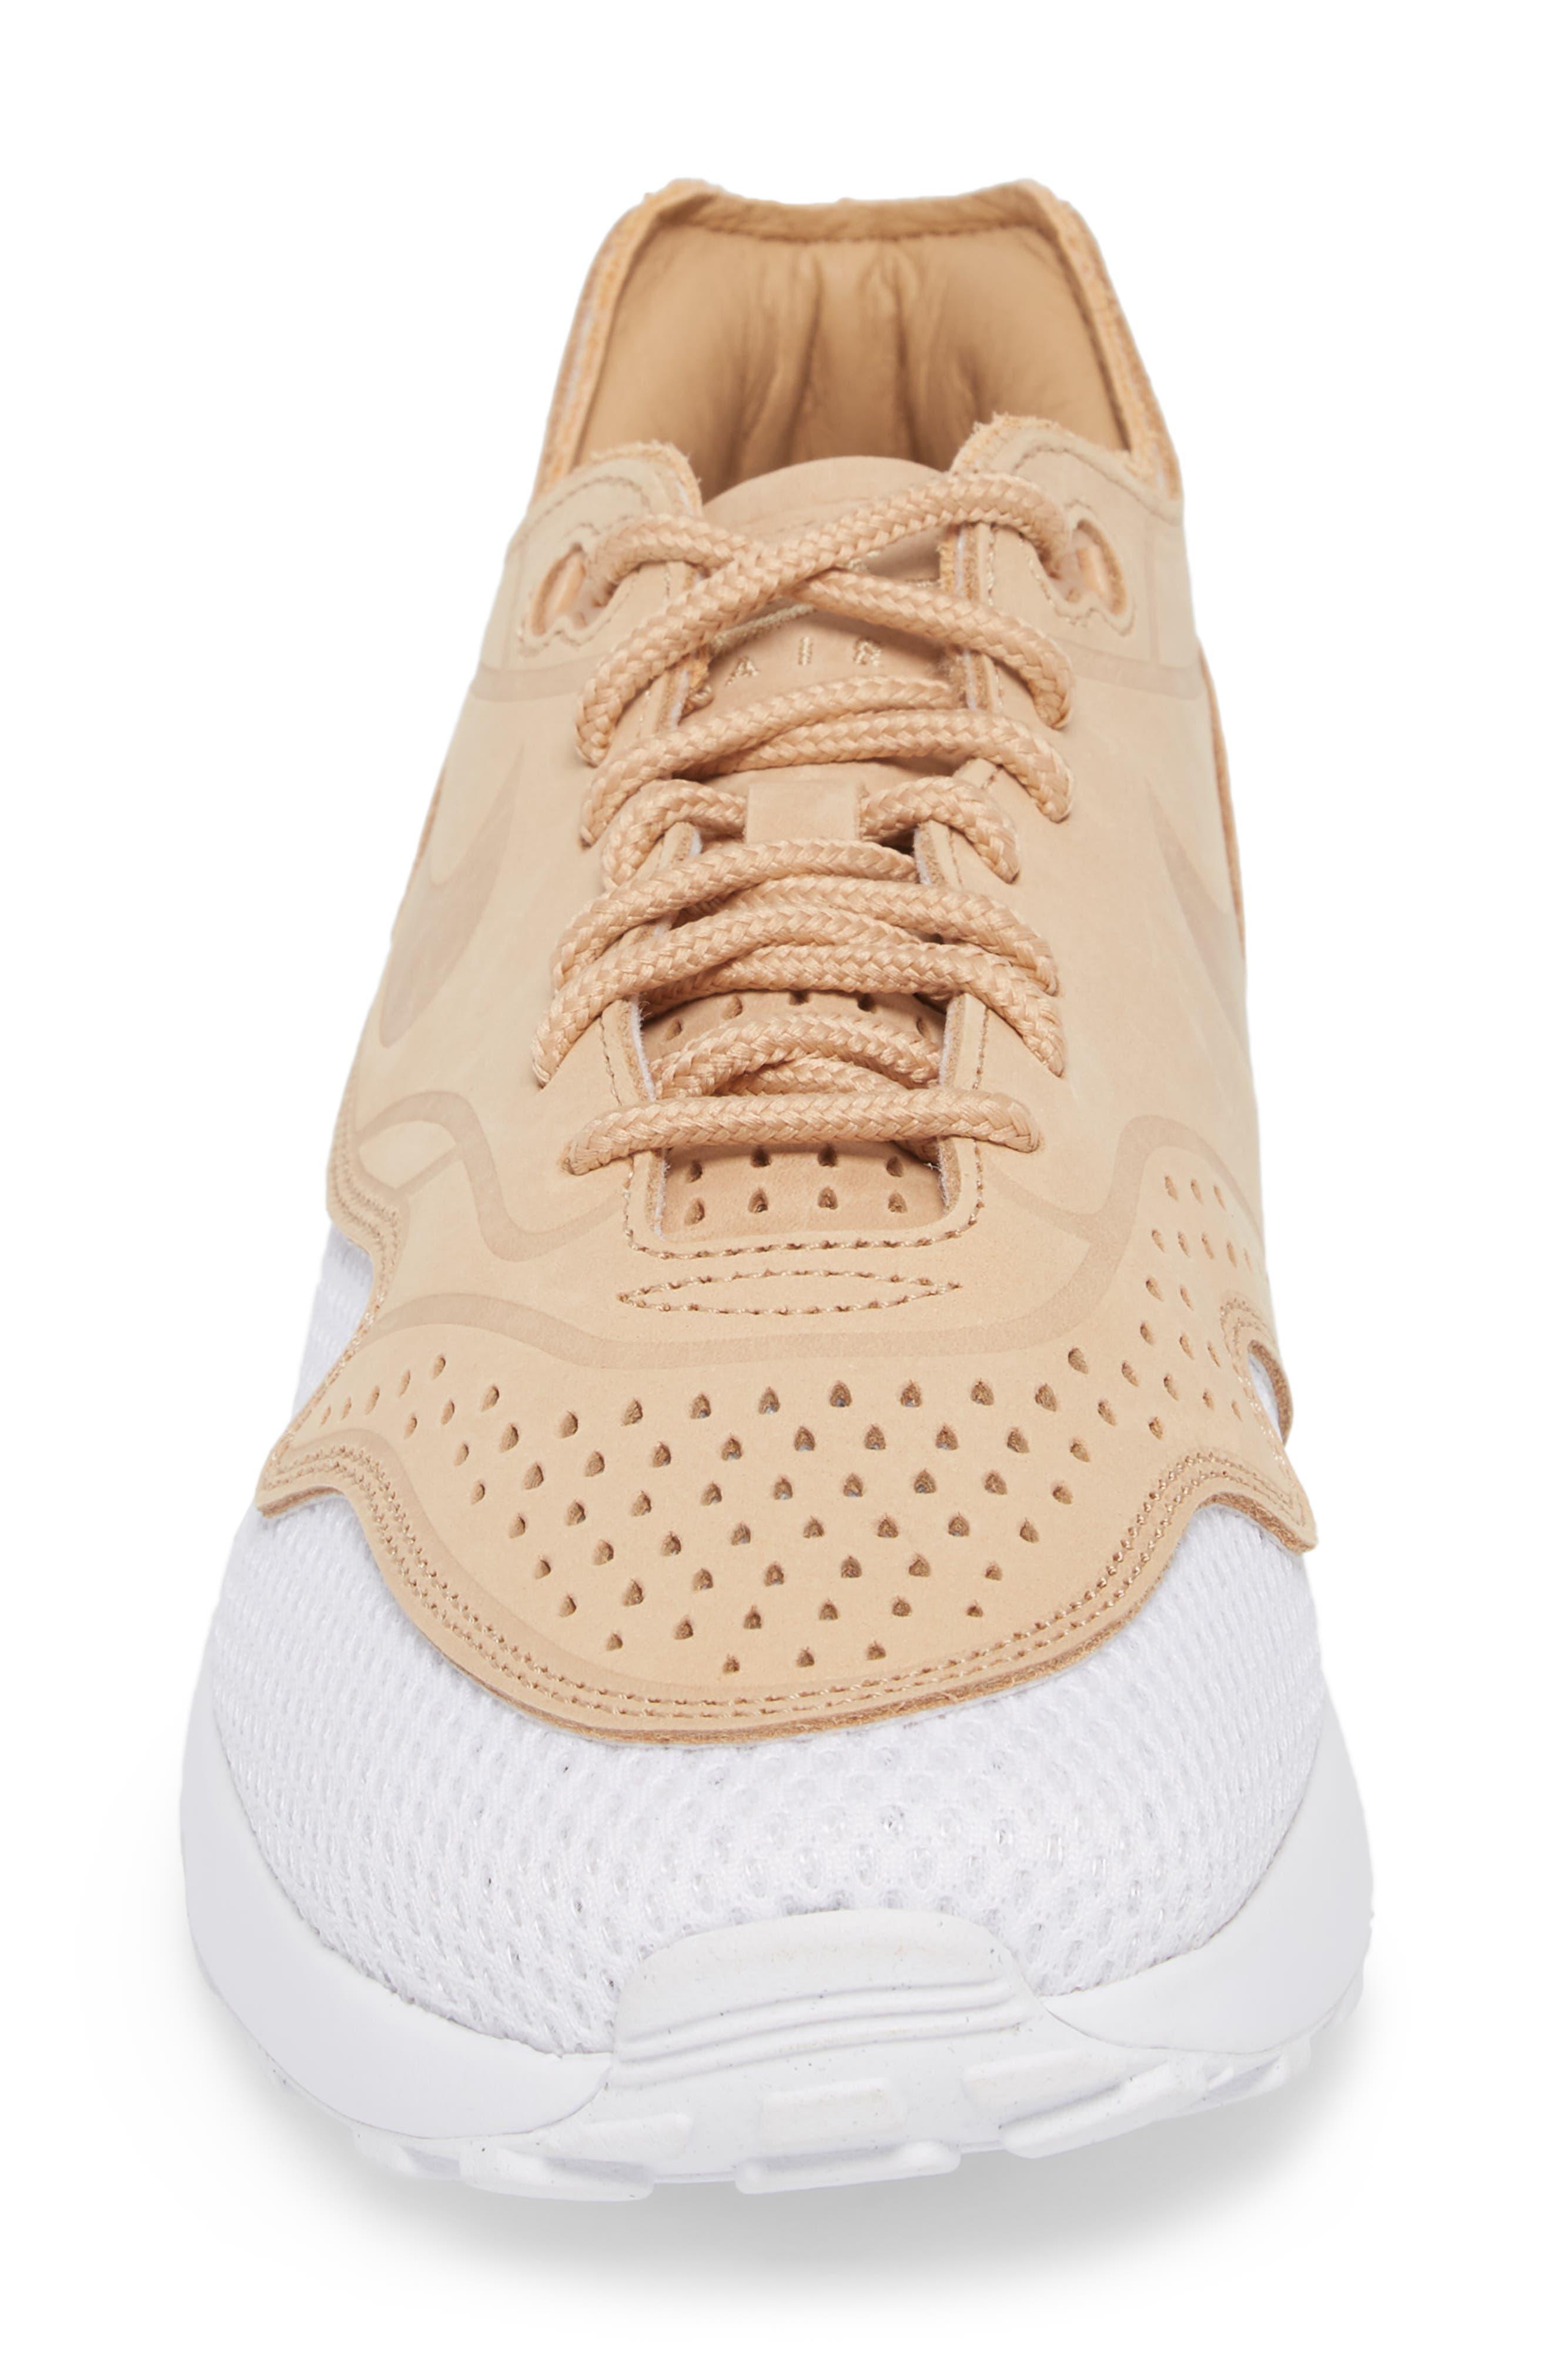 Air Max 1 Ultra 2.0 Premium Sneaker,                             Alternate thumbnail 4, color,                             Vachetta Tan/ White